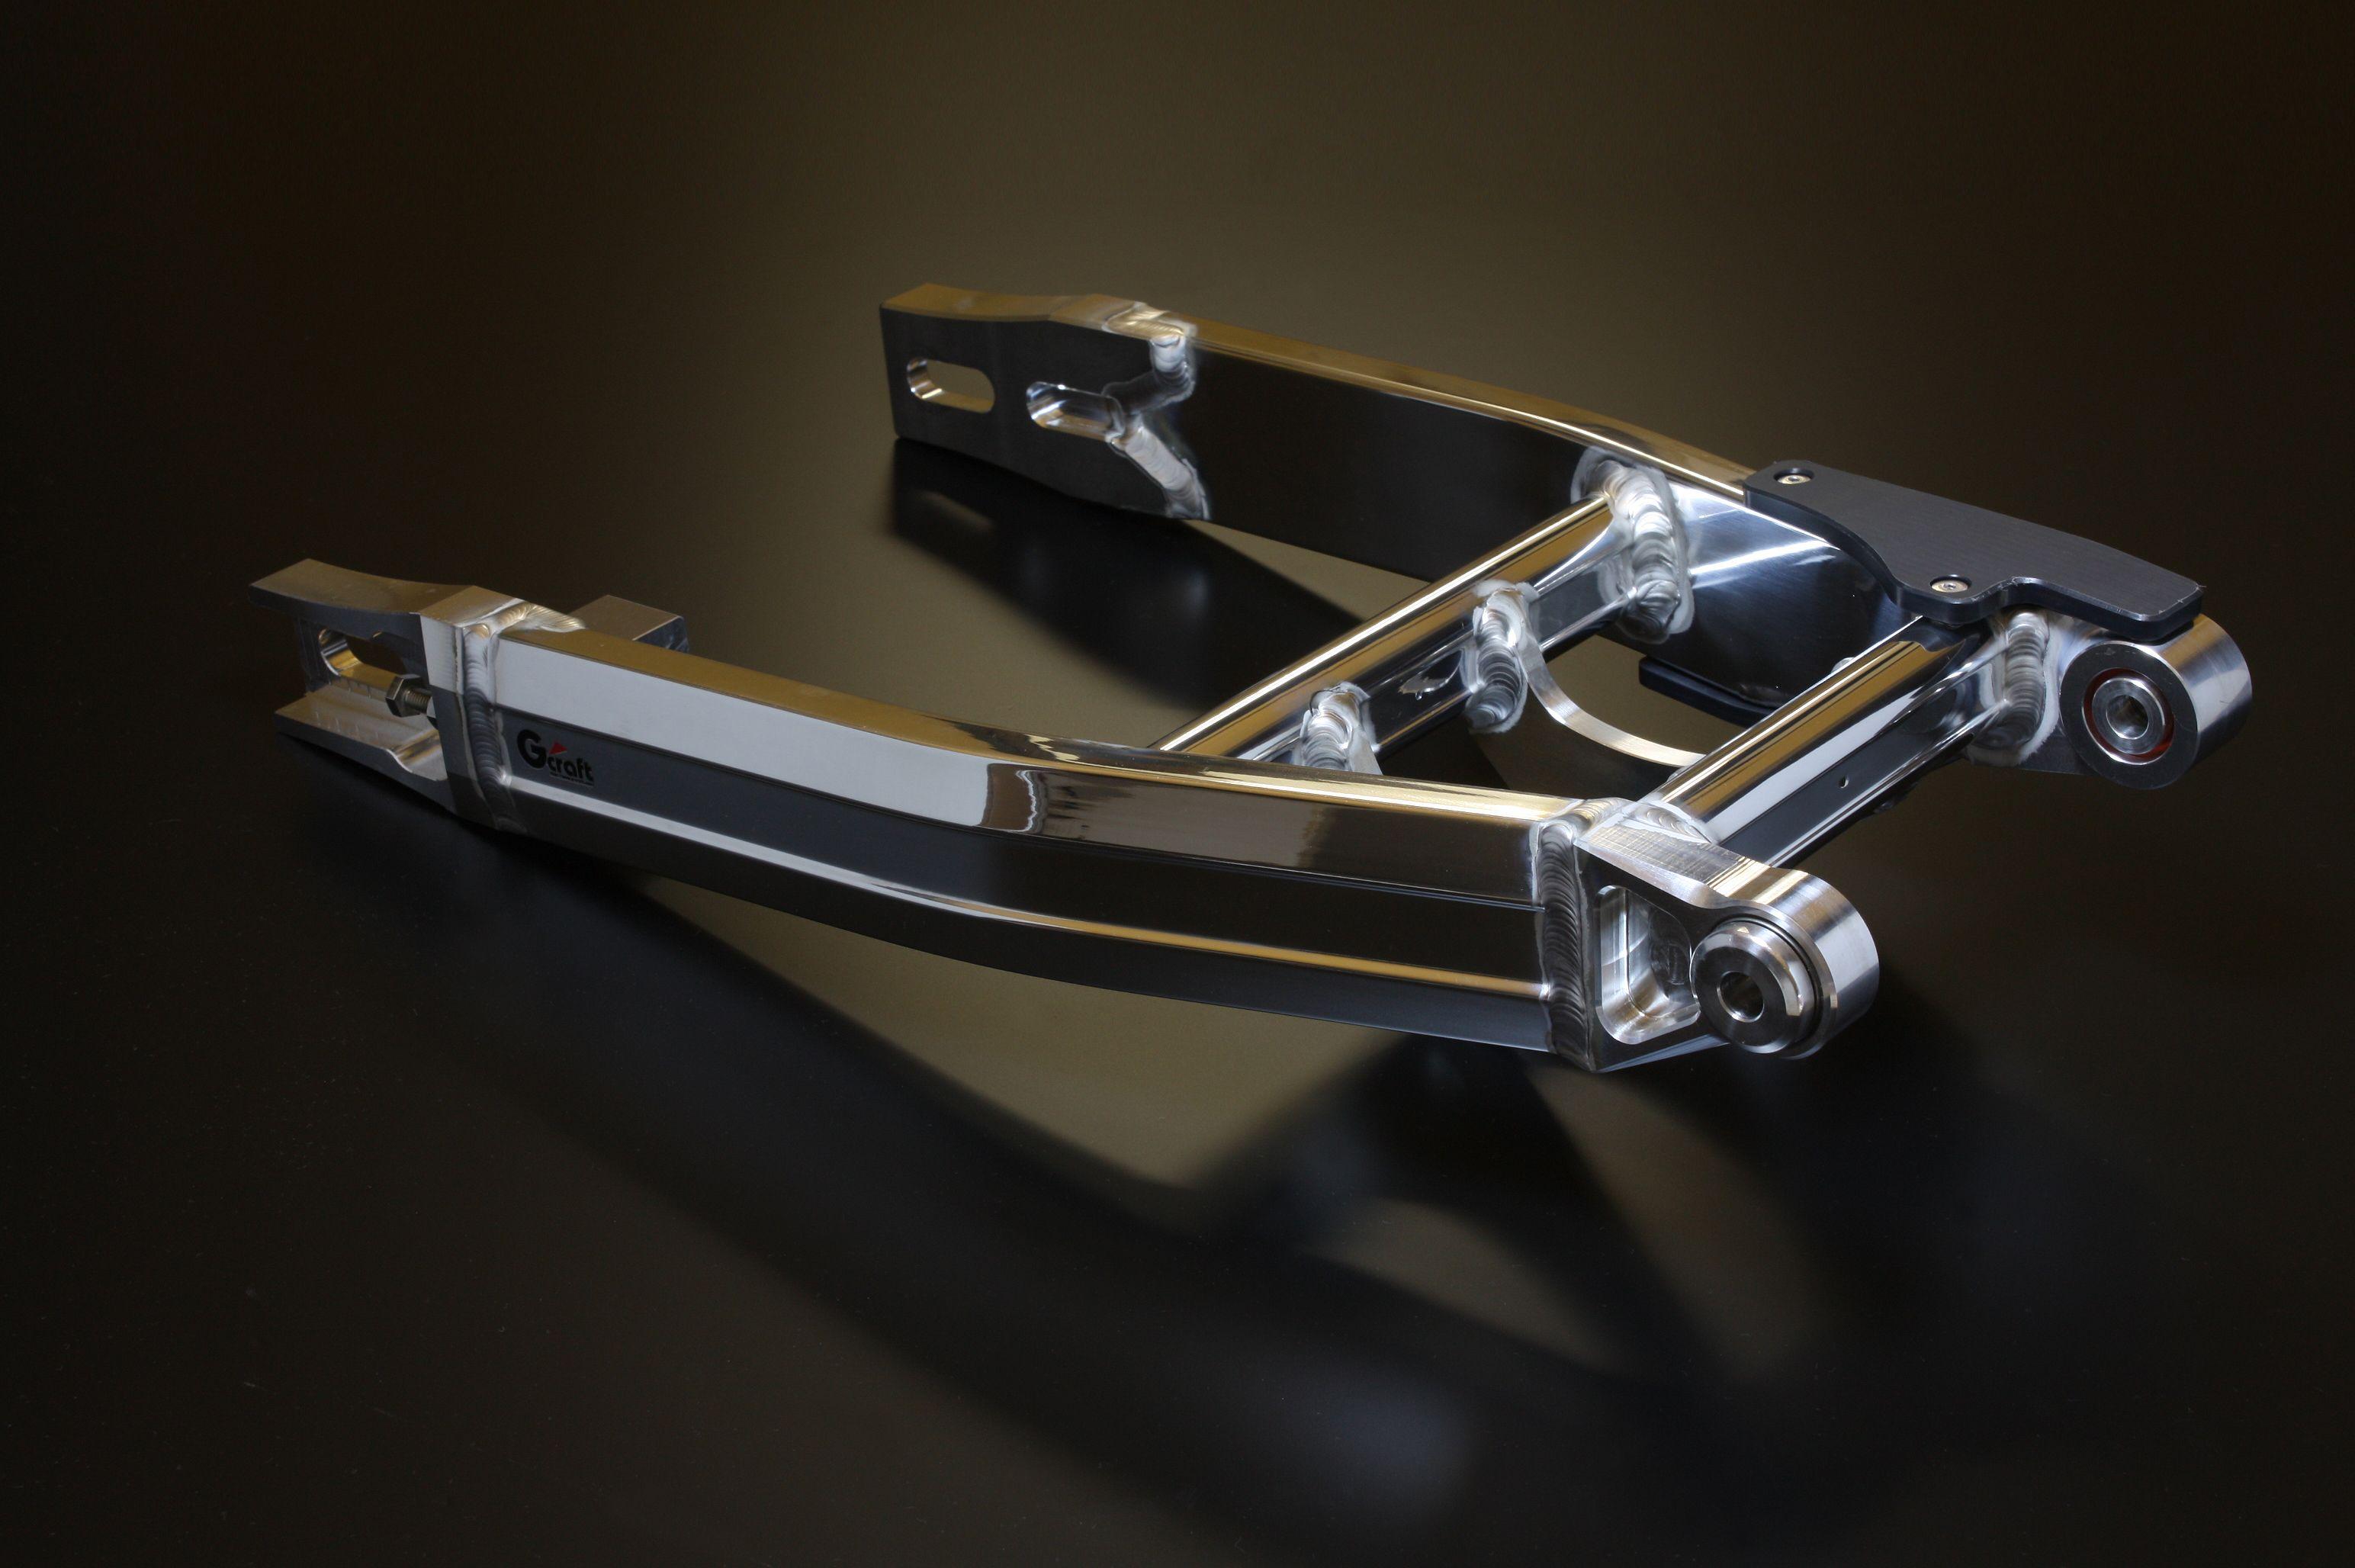 【G-Craft】超寬版MONO SHOCK mini多角型後搖臂 加長20cm - 「Webike-摩托百貨」